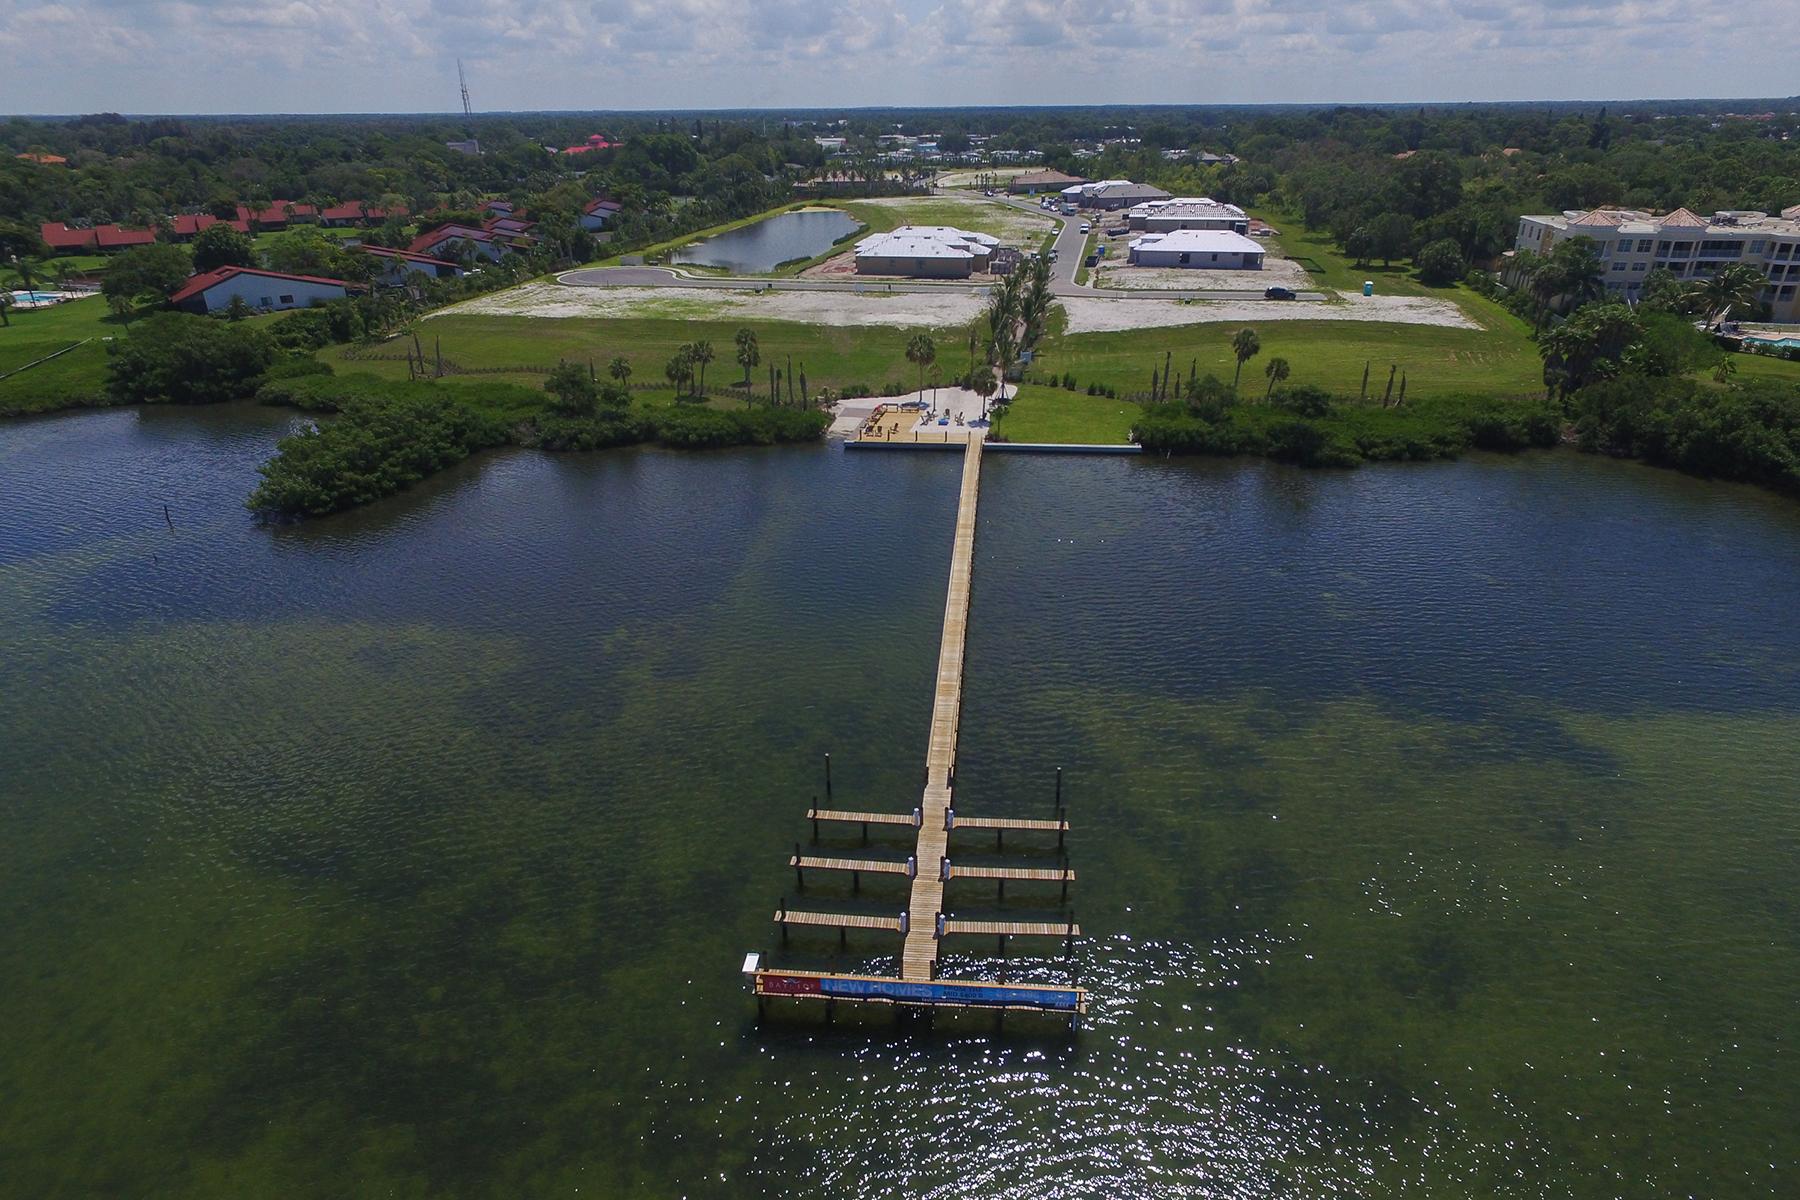 Terreno por un Venta en BAYSIDE 35 Masthead Dr 35 Osprey, Florida, 34229 Estados Unidos